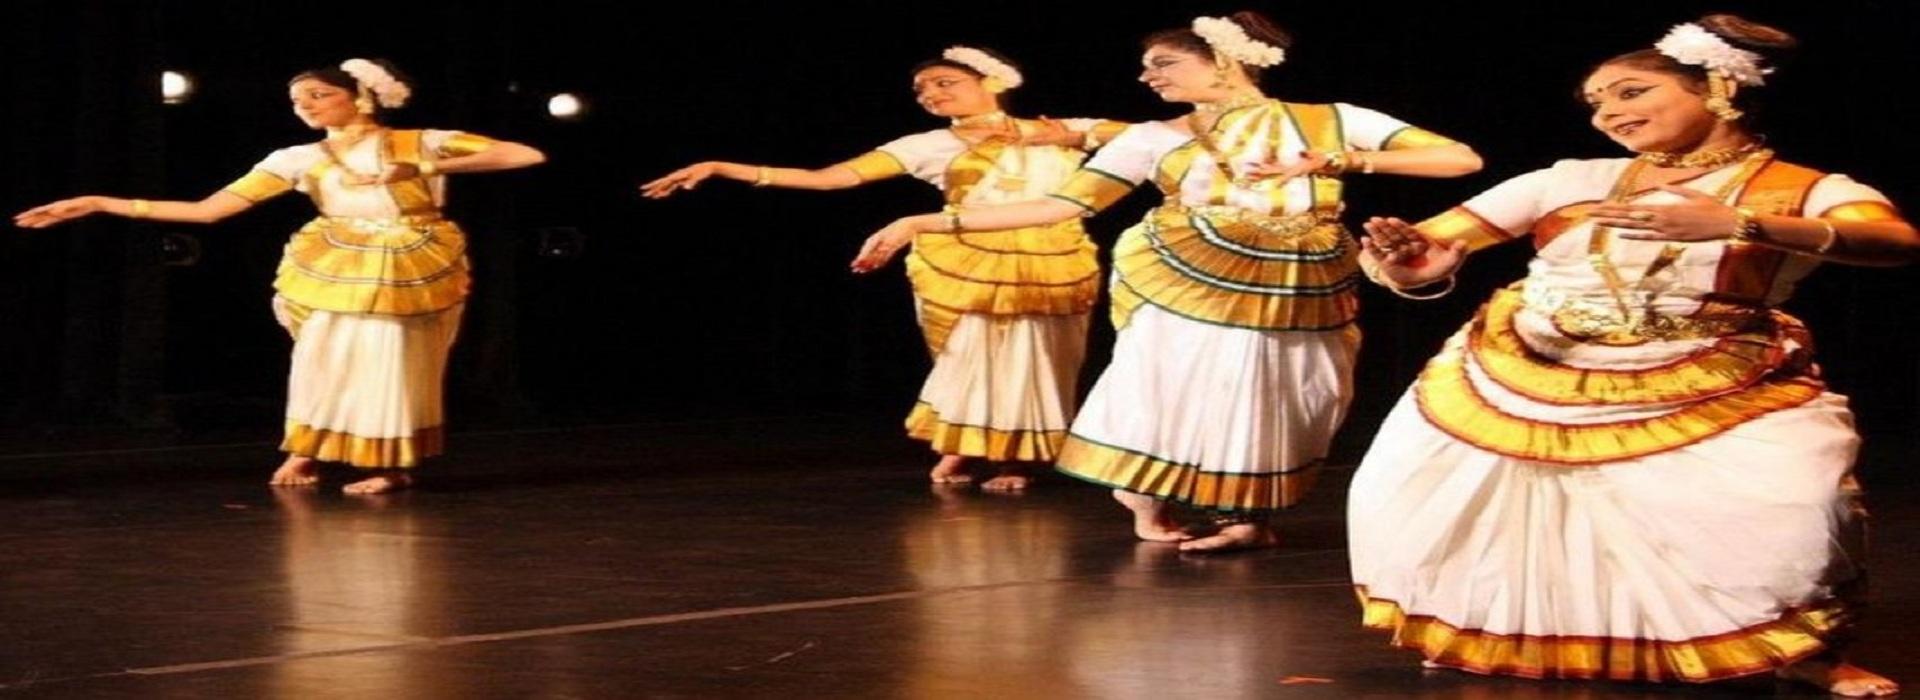 Kerala Folk Dances and Dance Dramas